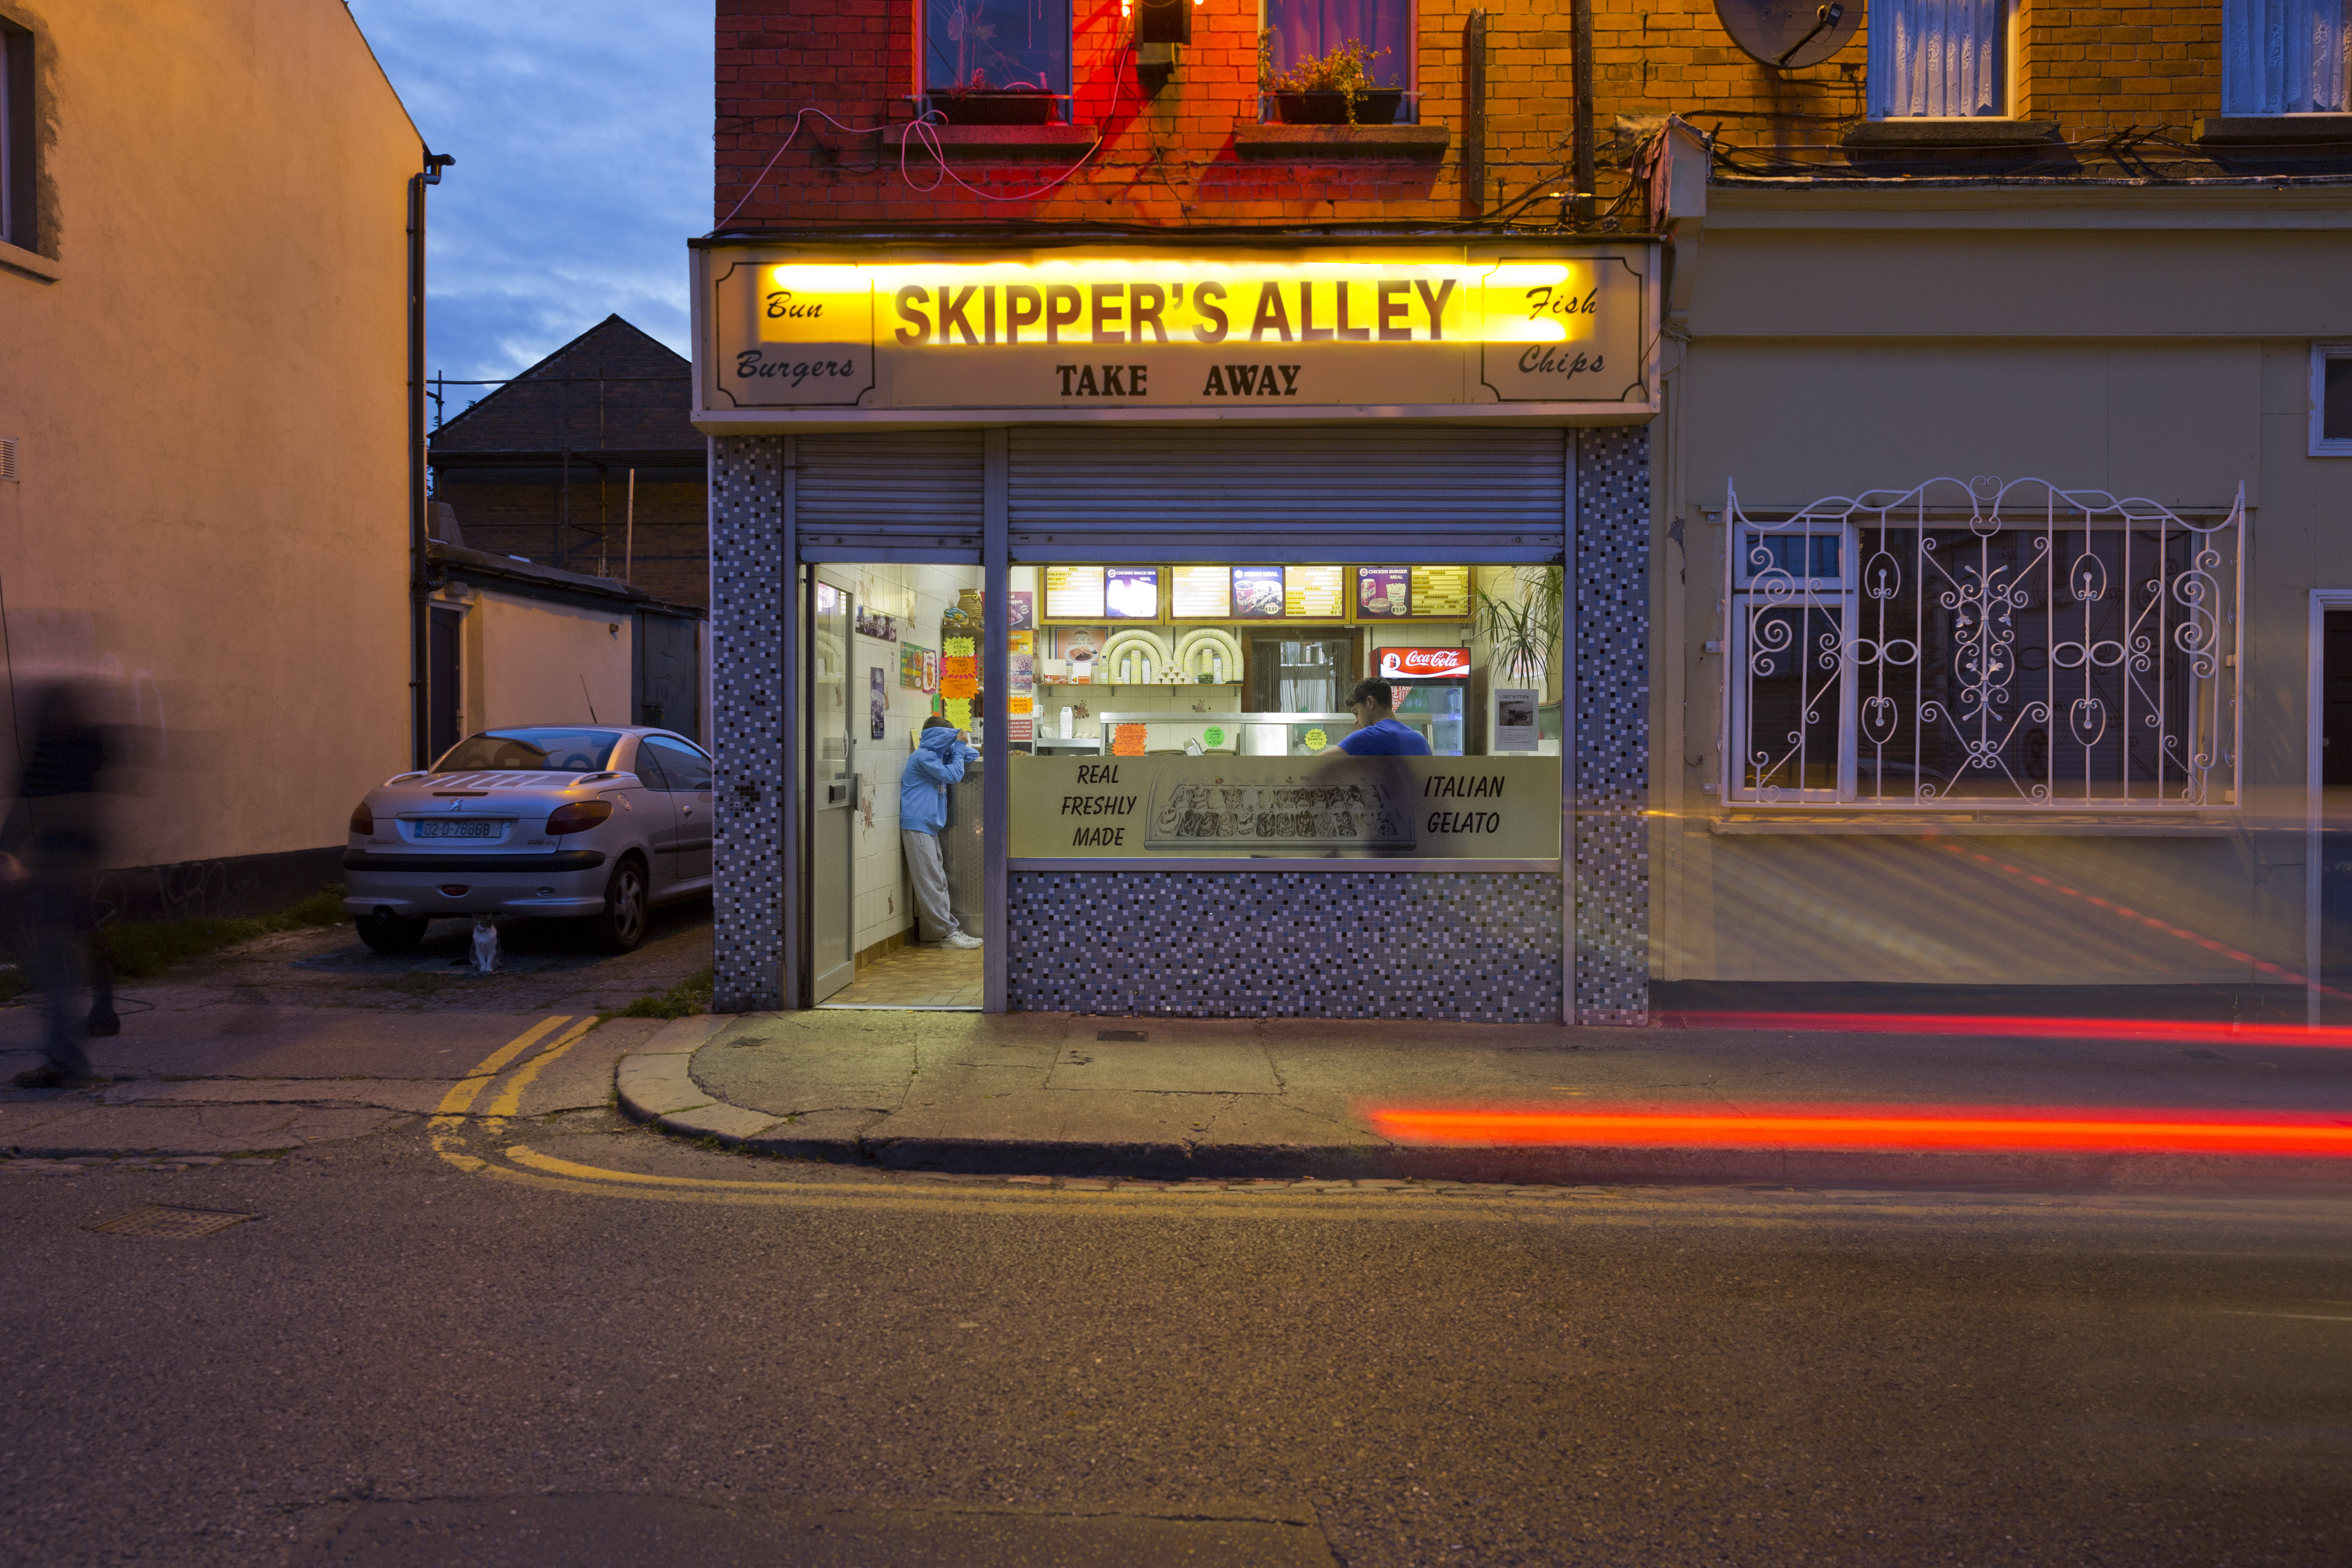 Cover image: Skipper's Alley - Album Artwork